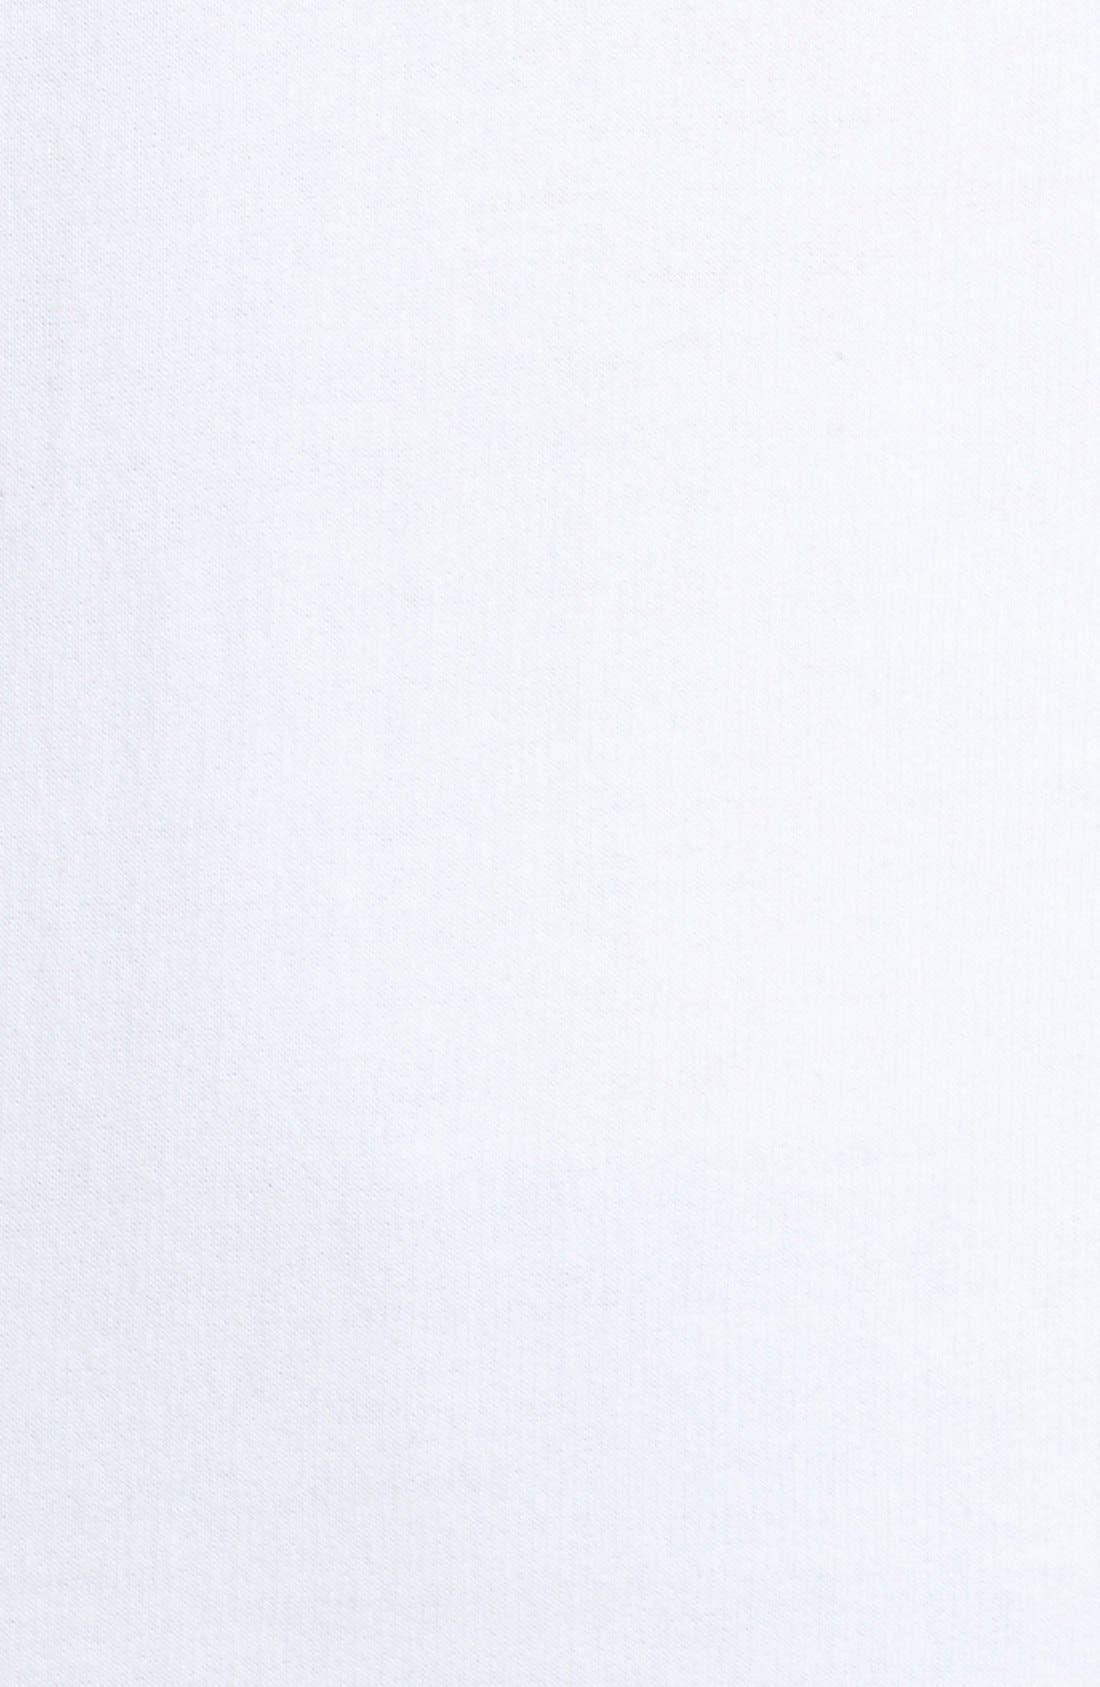 BRUNETTE THE LABEL, Brunette 'Roll Call' Crewneck Sweatshirt, Alternate thumbnail 4, color, 100